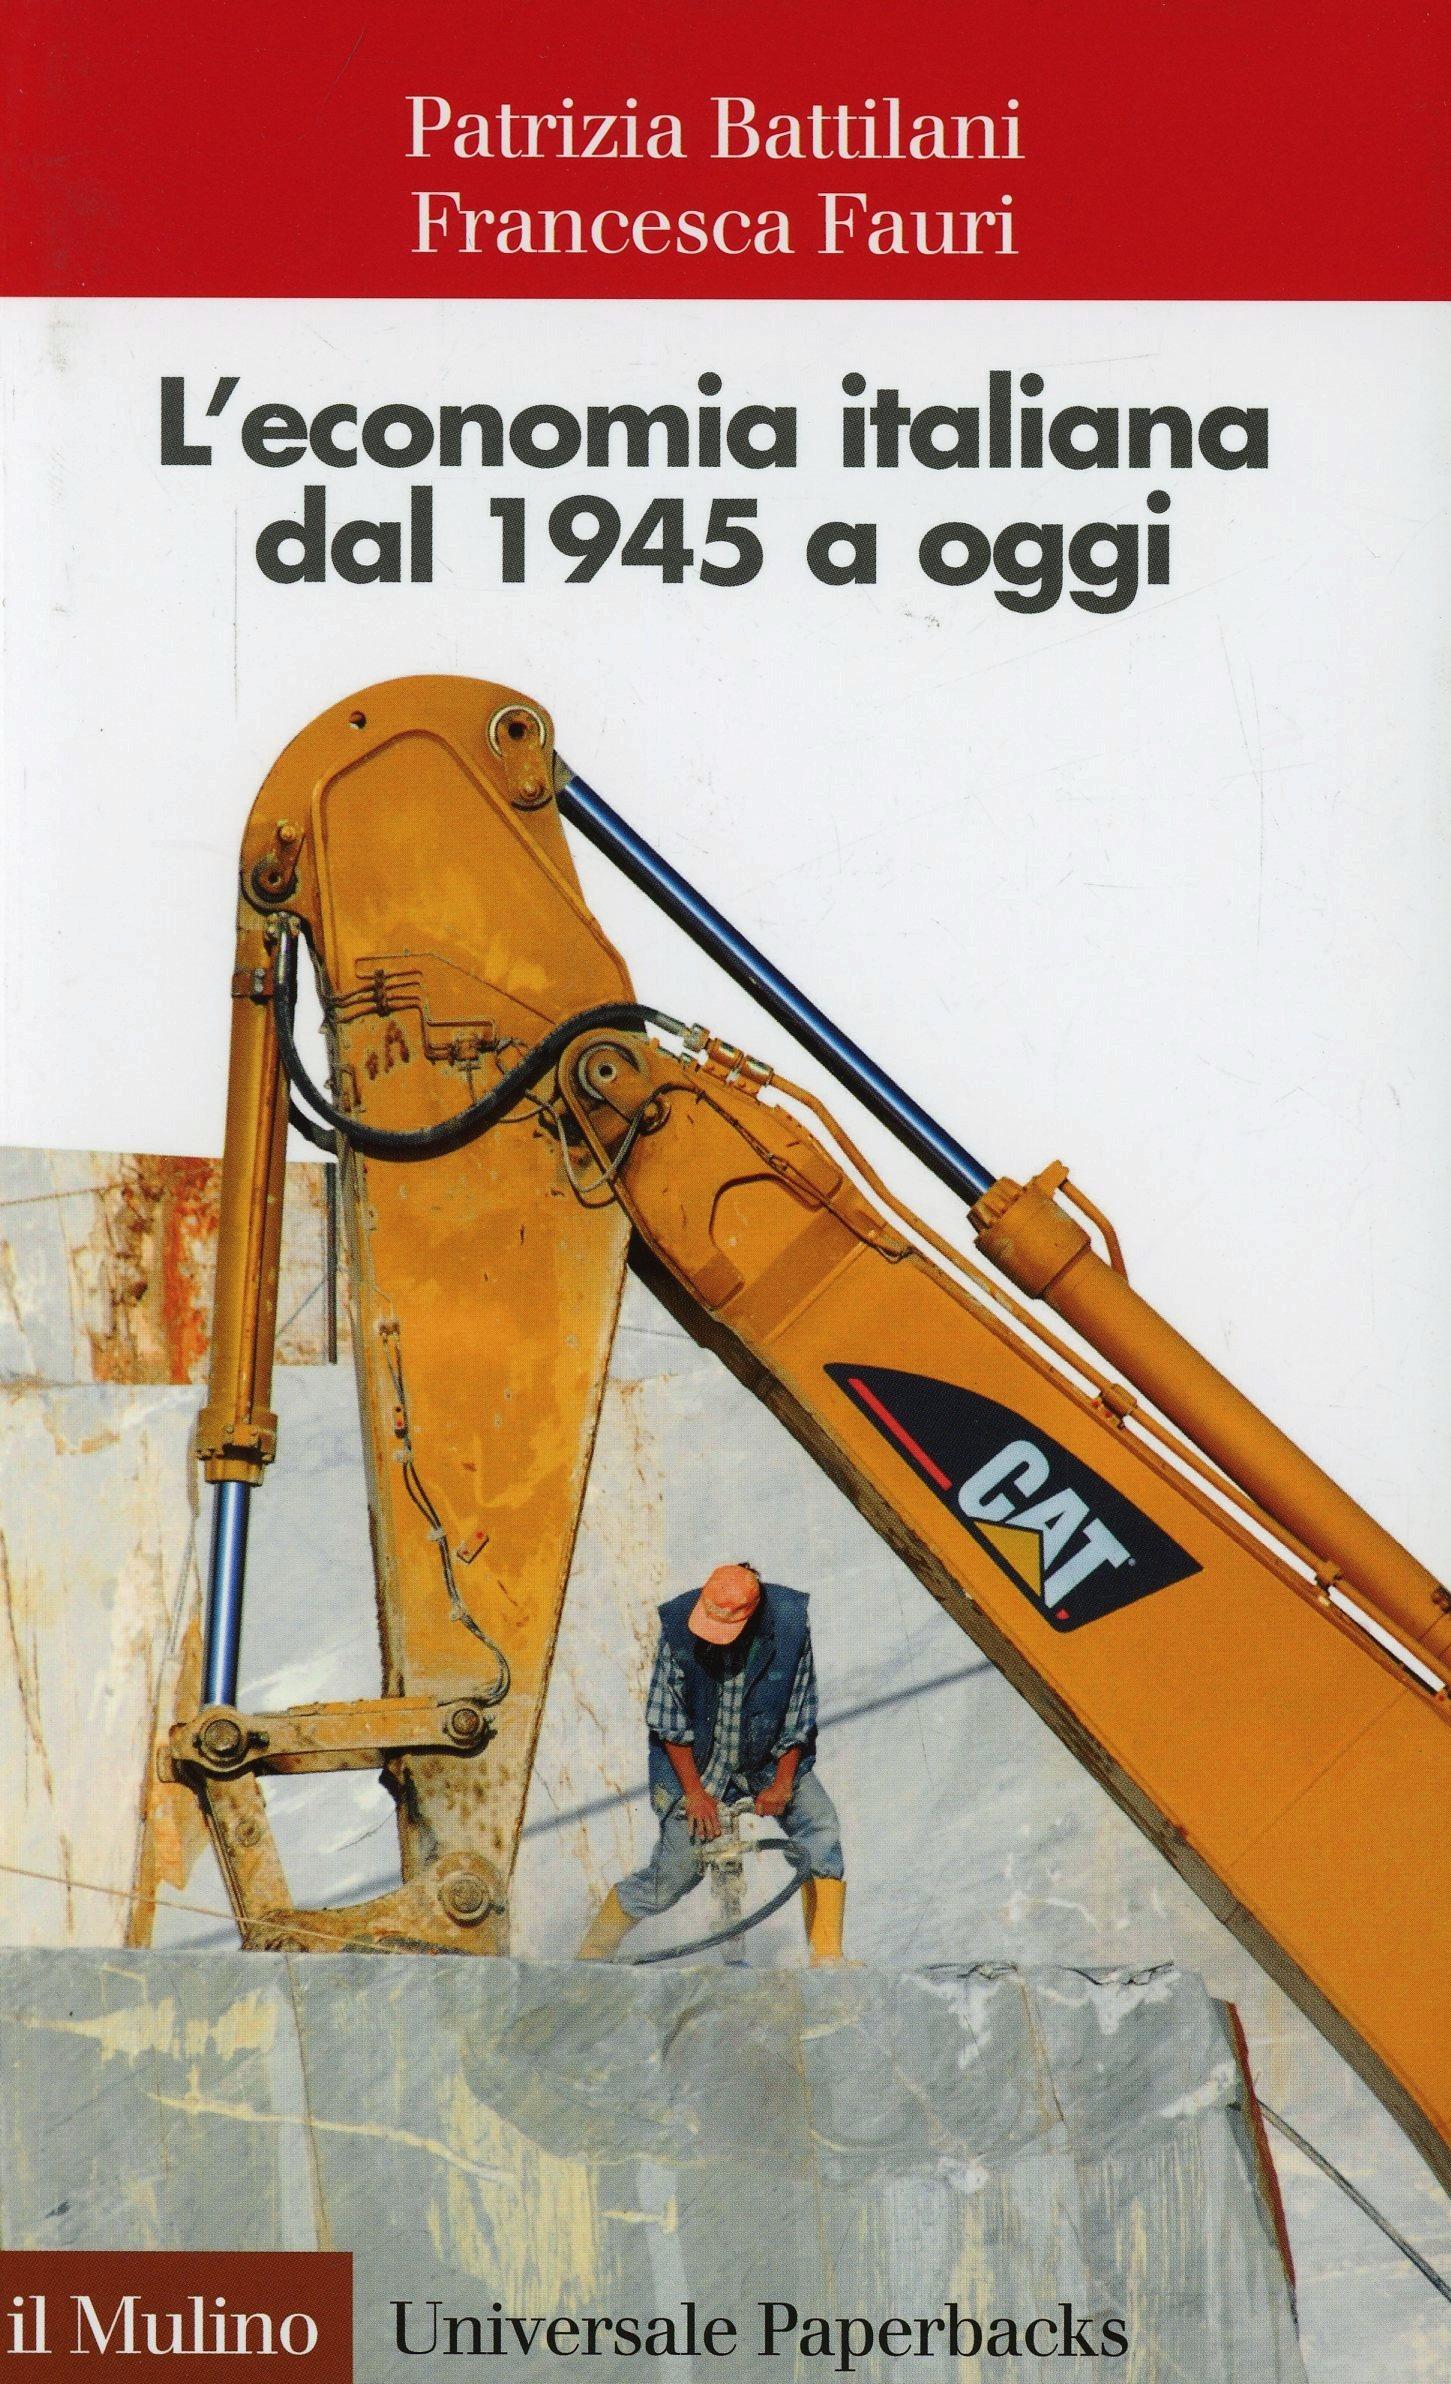 L'economia italiana dal 1945 a oggi